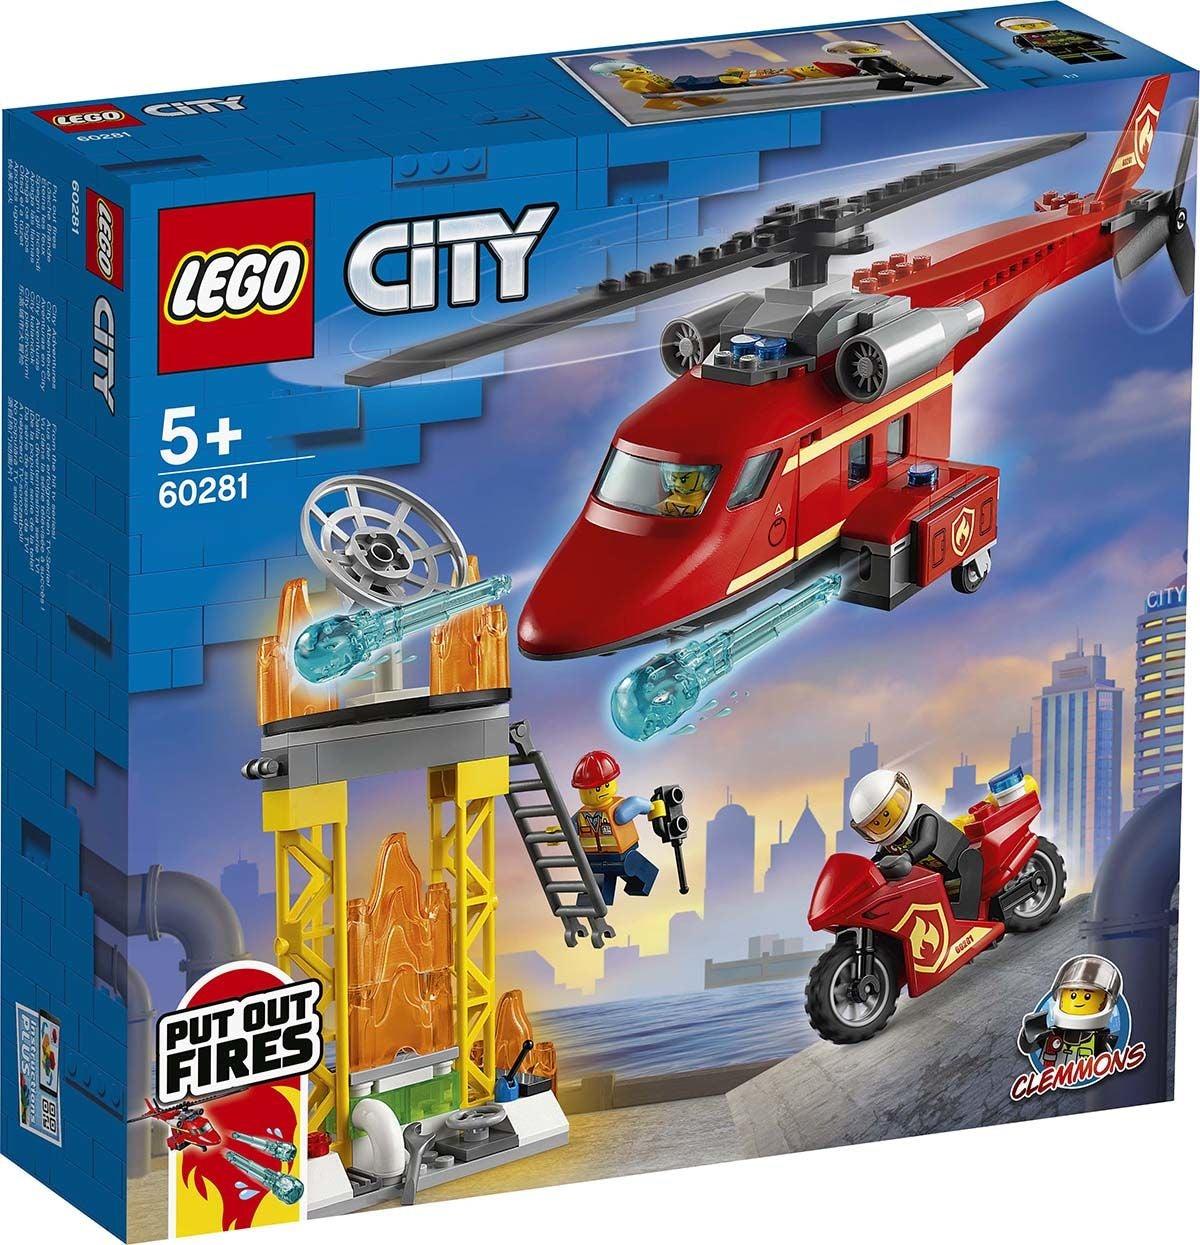 LEGO City Fire 60281 Palopelastushelikopteri